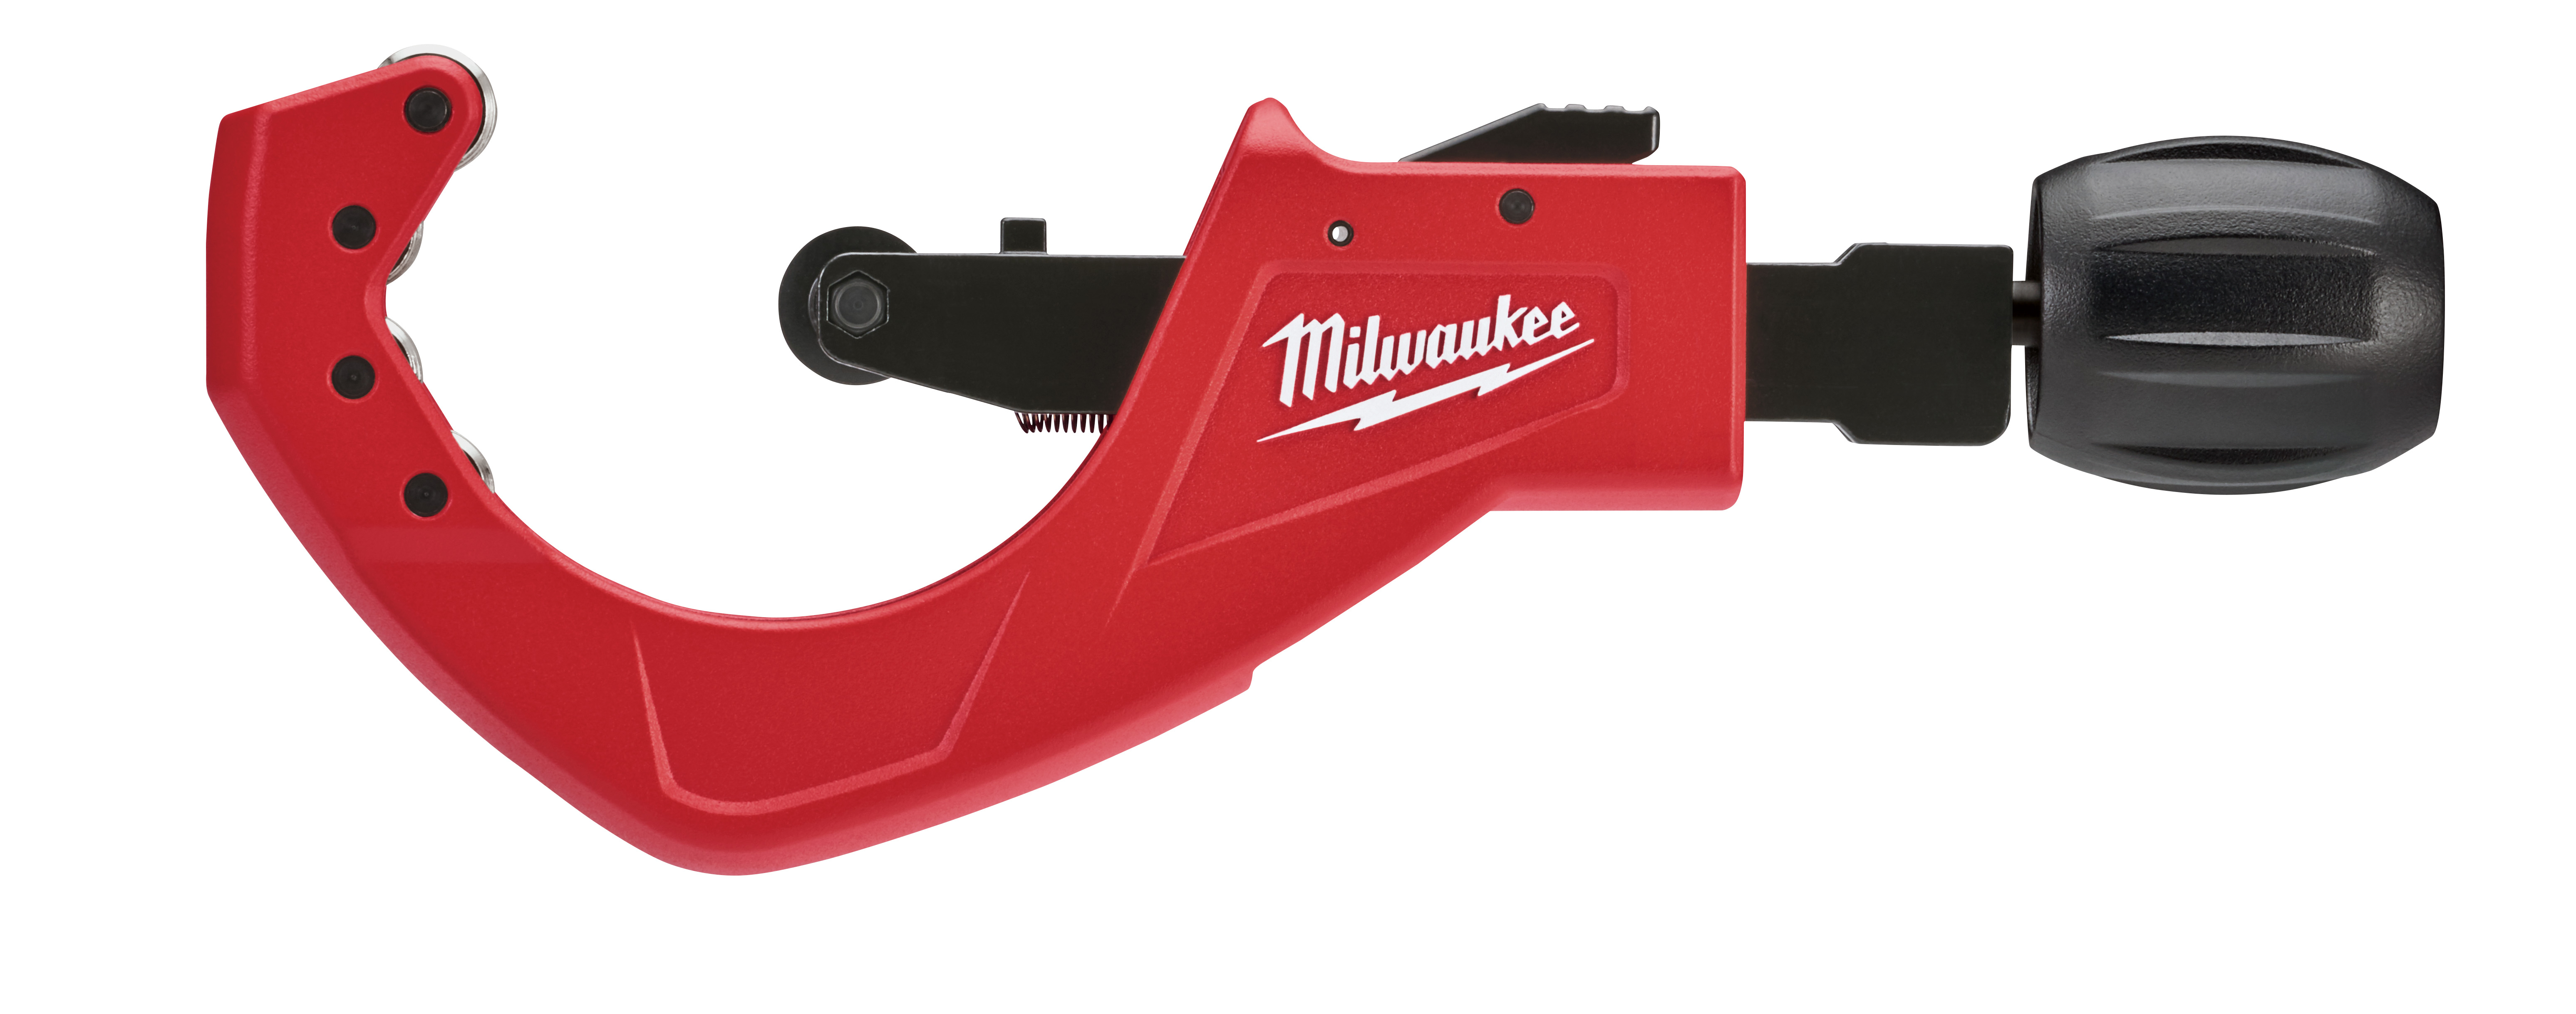 "Milwaukee 48-22-4253 2-1/2"" Quick Adjust Copper Tubing Cutter"